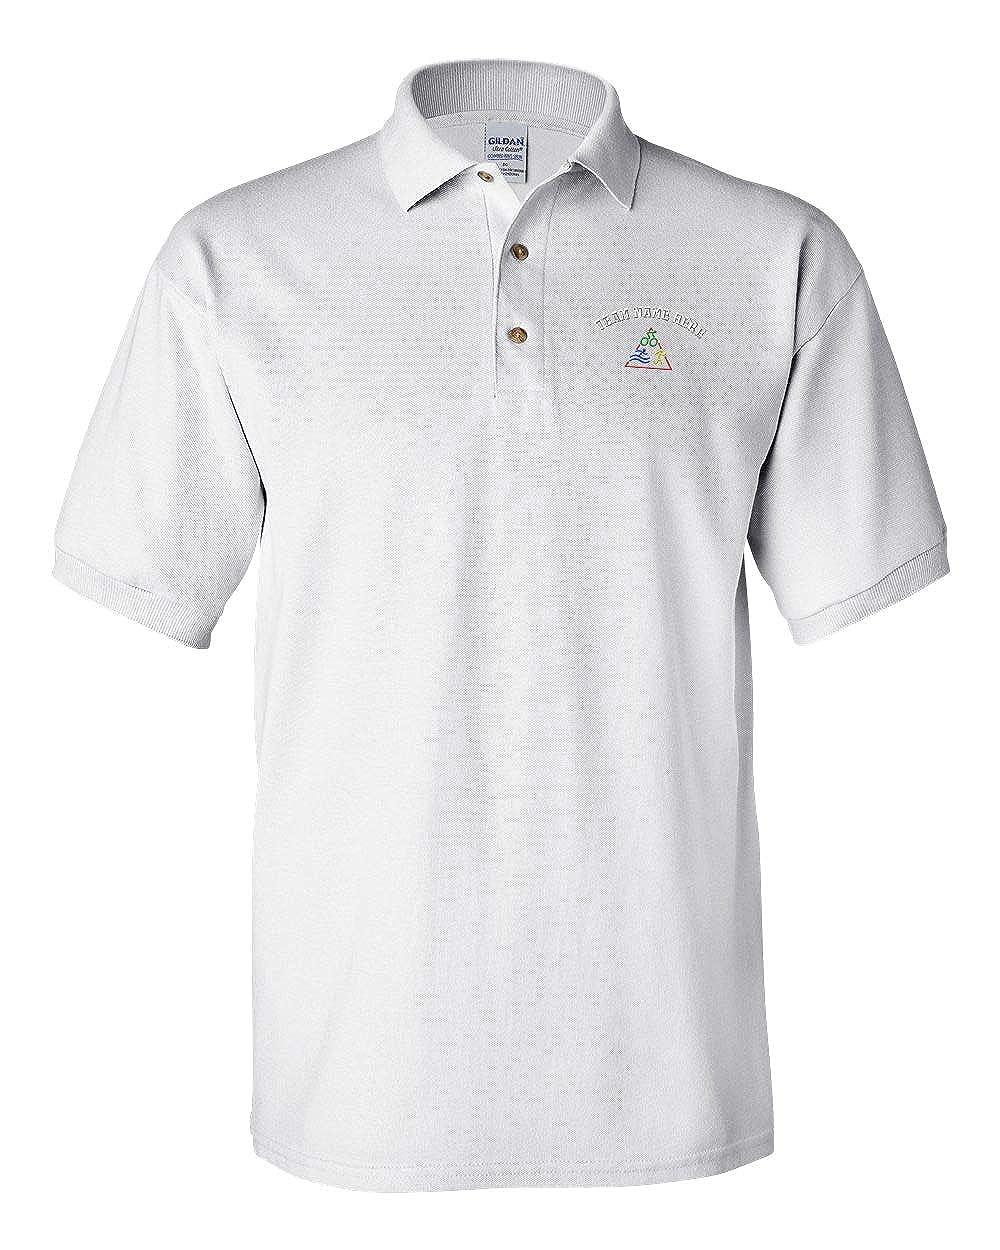 Custom Made Polo Shirts With Logo